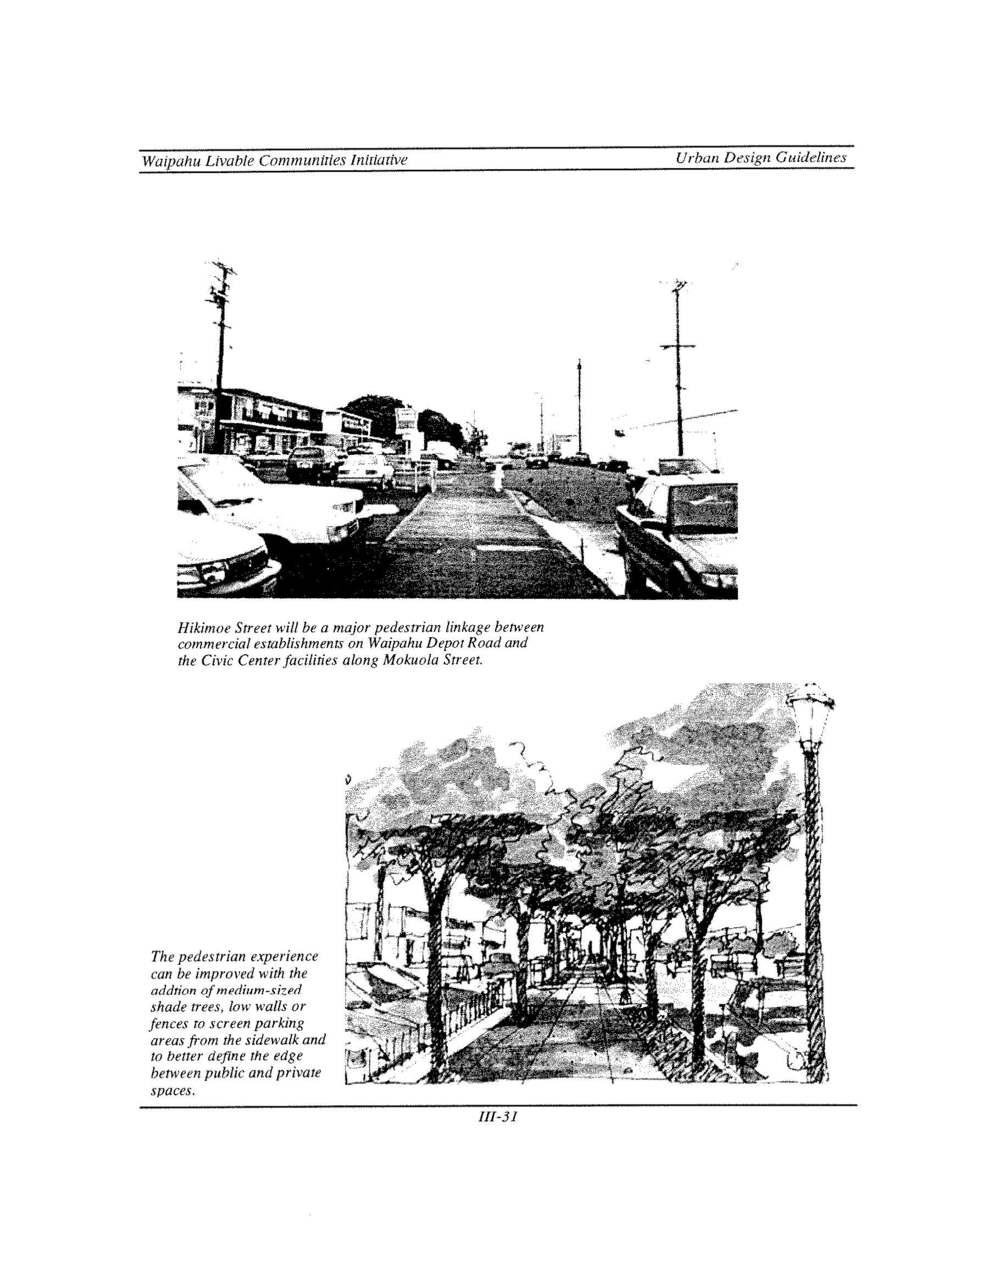 160531_WaipahuLivableCommunities(1998)_Page_121.jpg